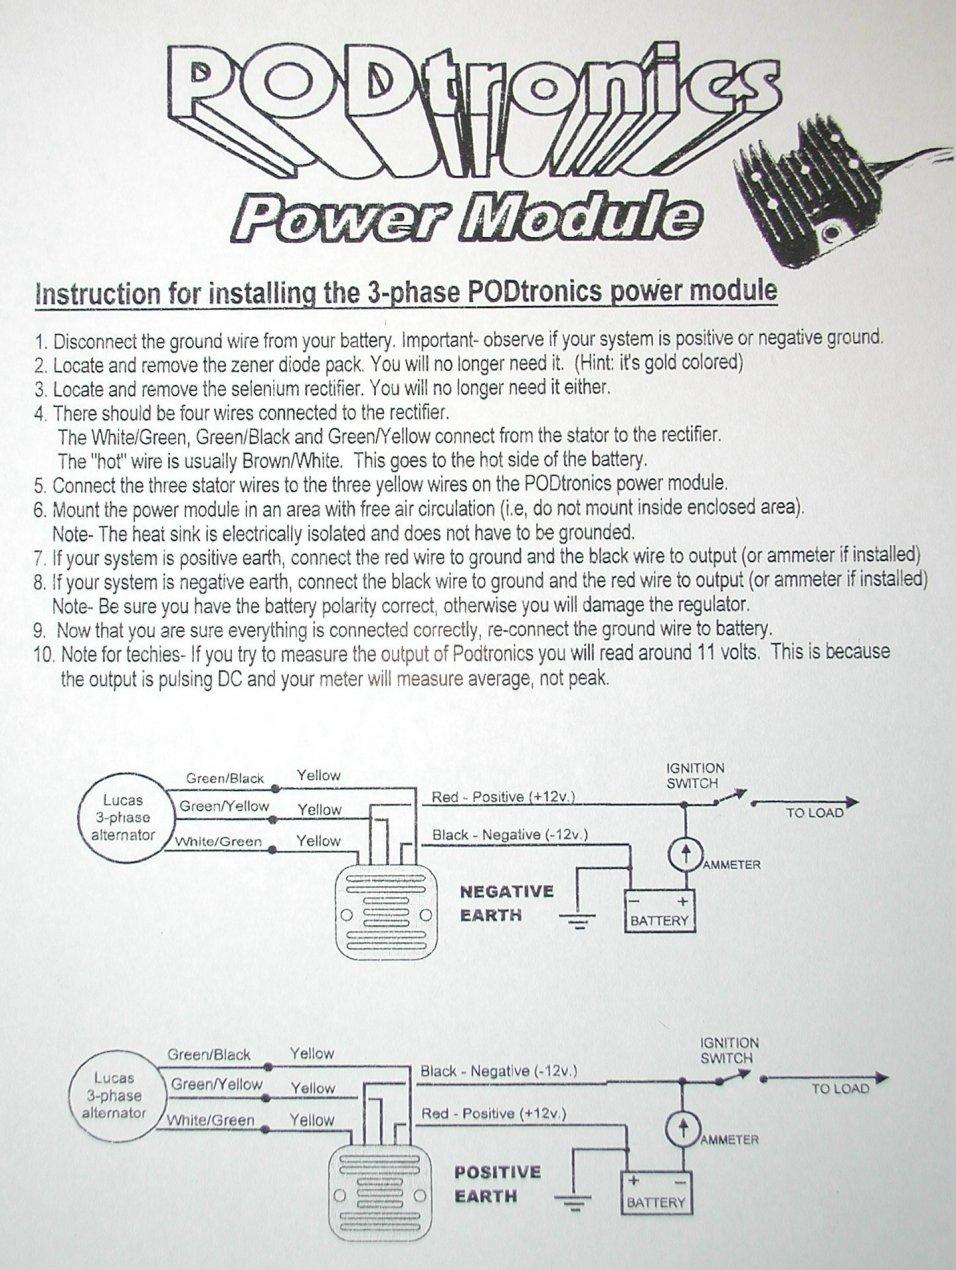 medium resolution of podtronics wiring diagram wire management wiring diagram podtronics wiring diagram source podtronics regulator rectifier